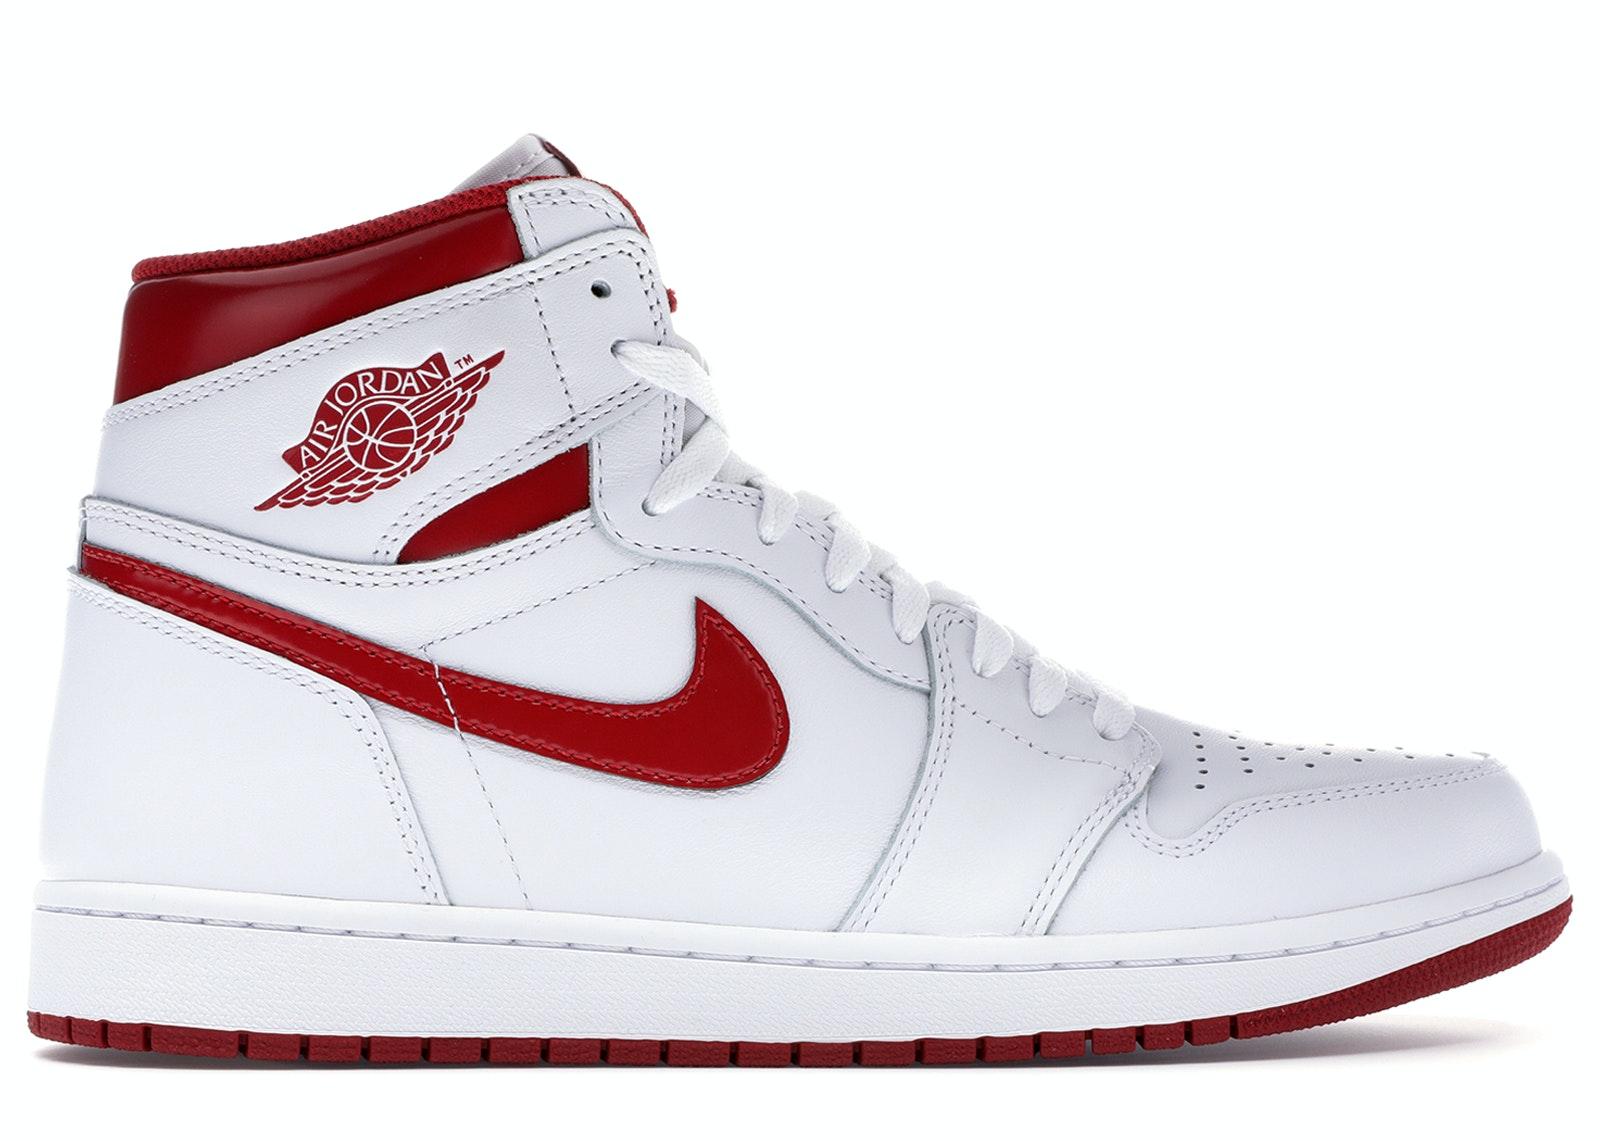 Jordan 1 Retro Metallic Red (2017)